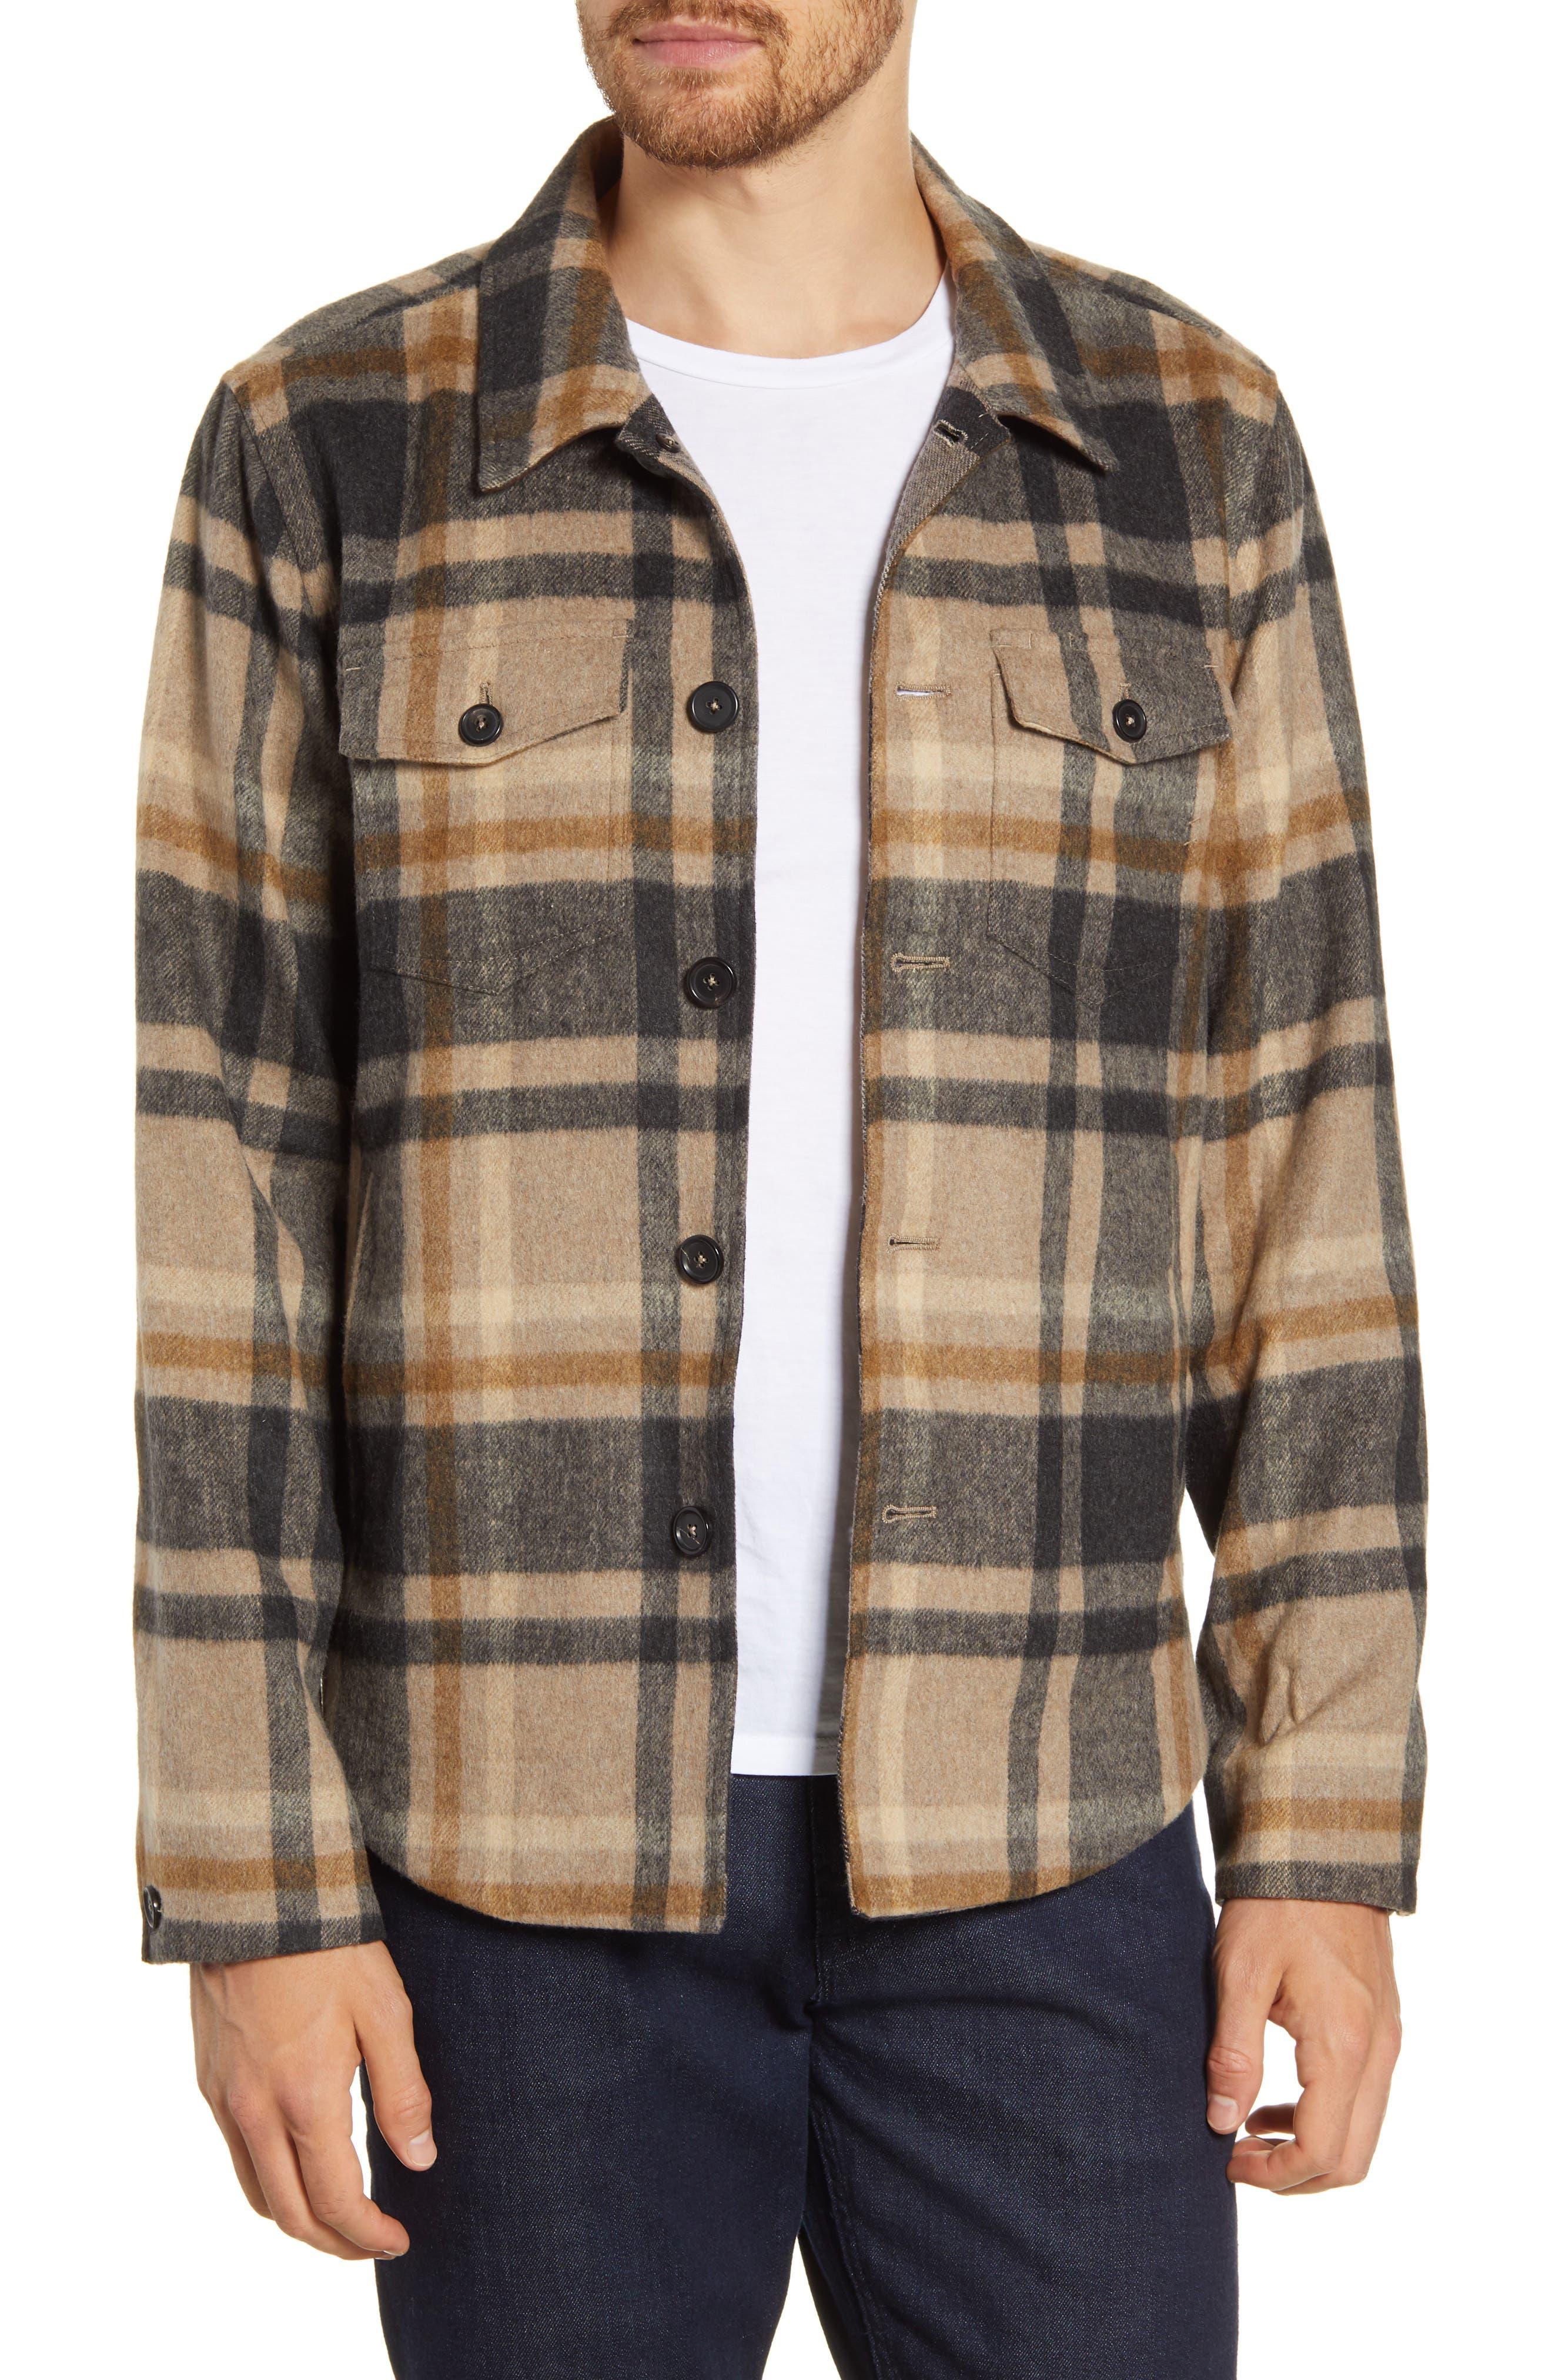 Standard Fit Plaid Button-Up Flannel Shirt Jacket